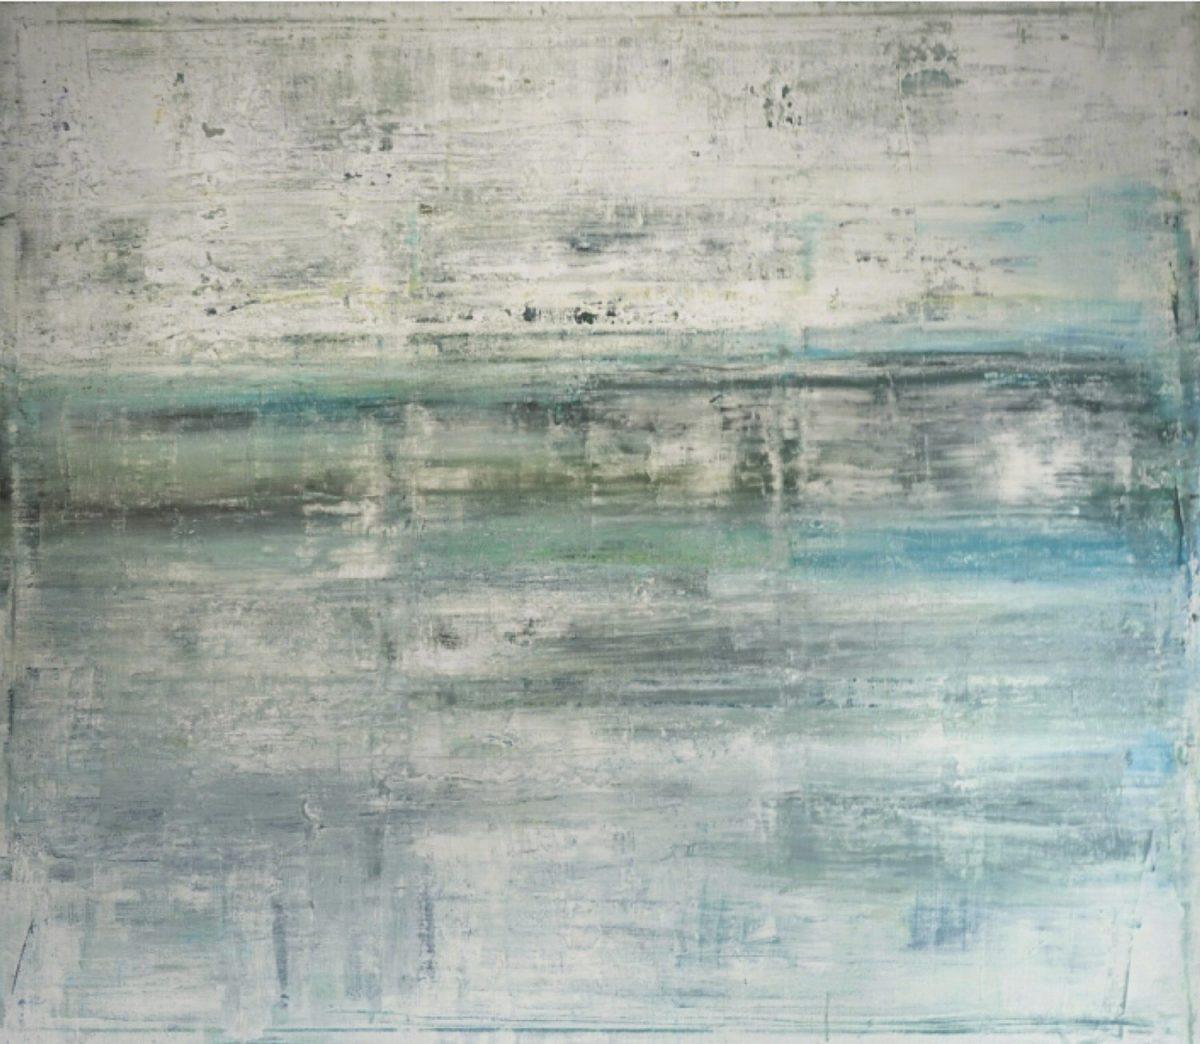 Fabian Kiepenheuer, Untitled Nr. 8, 2016